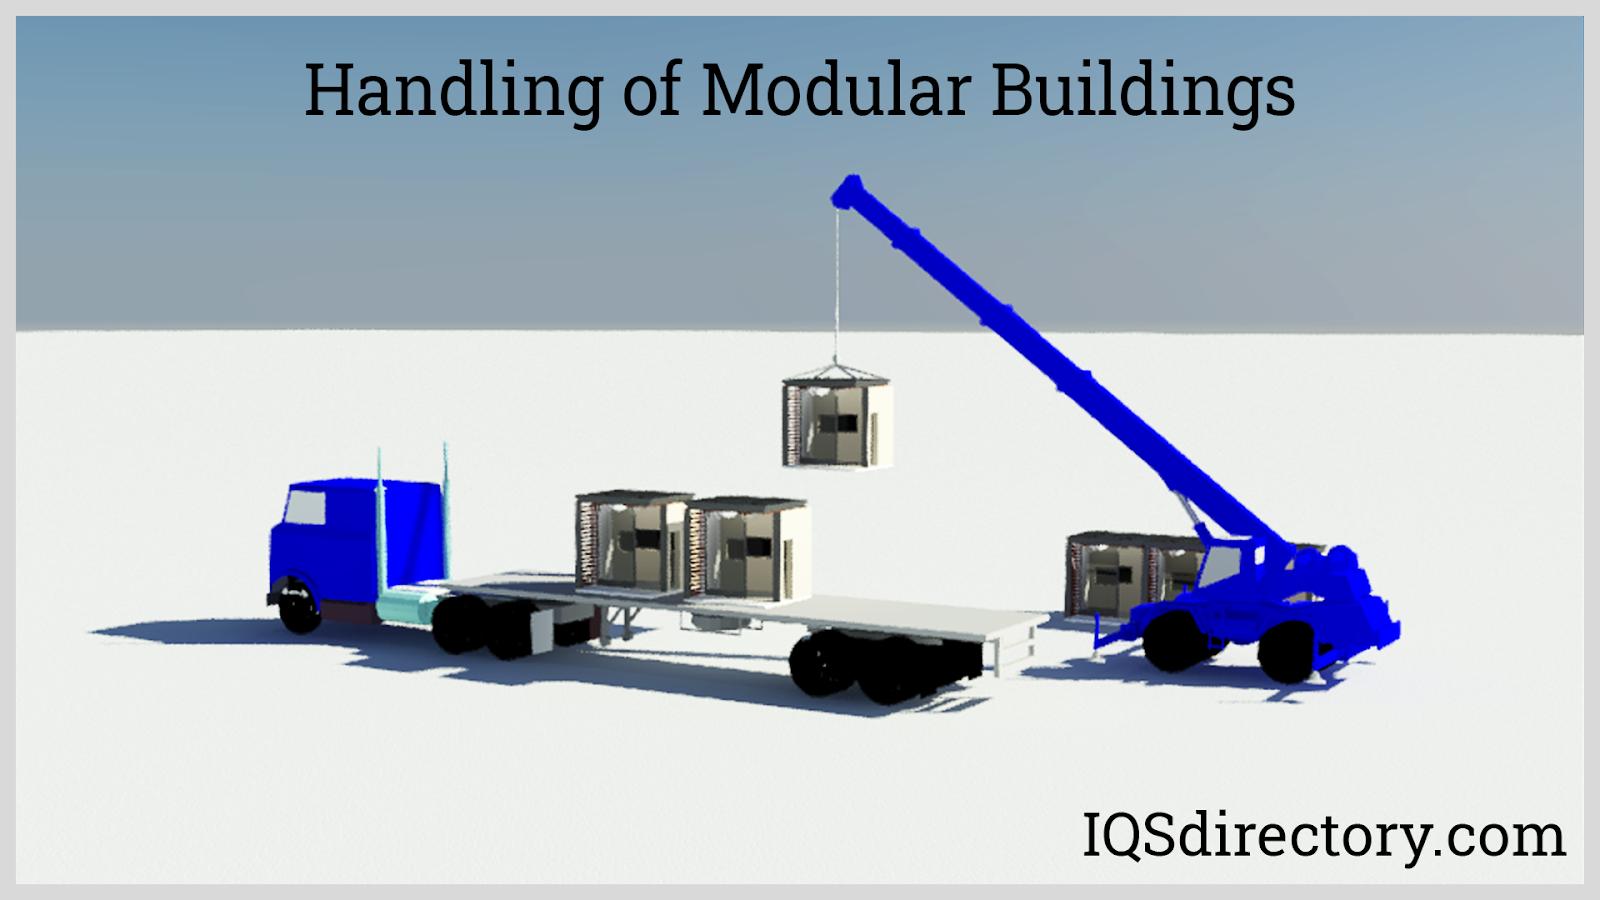 Handling of Modular Buildings